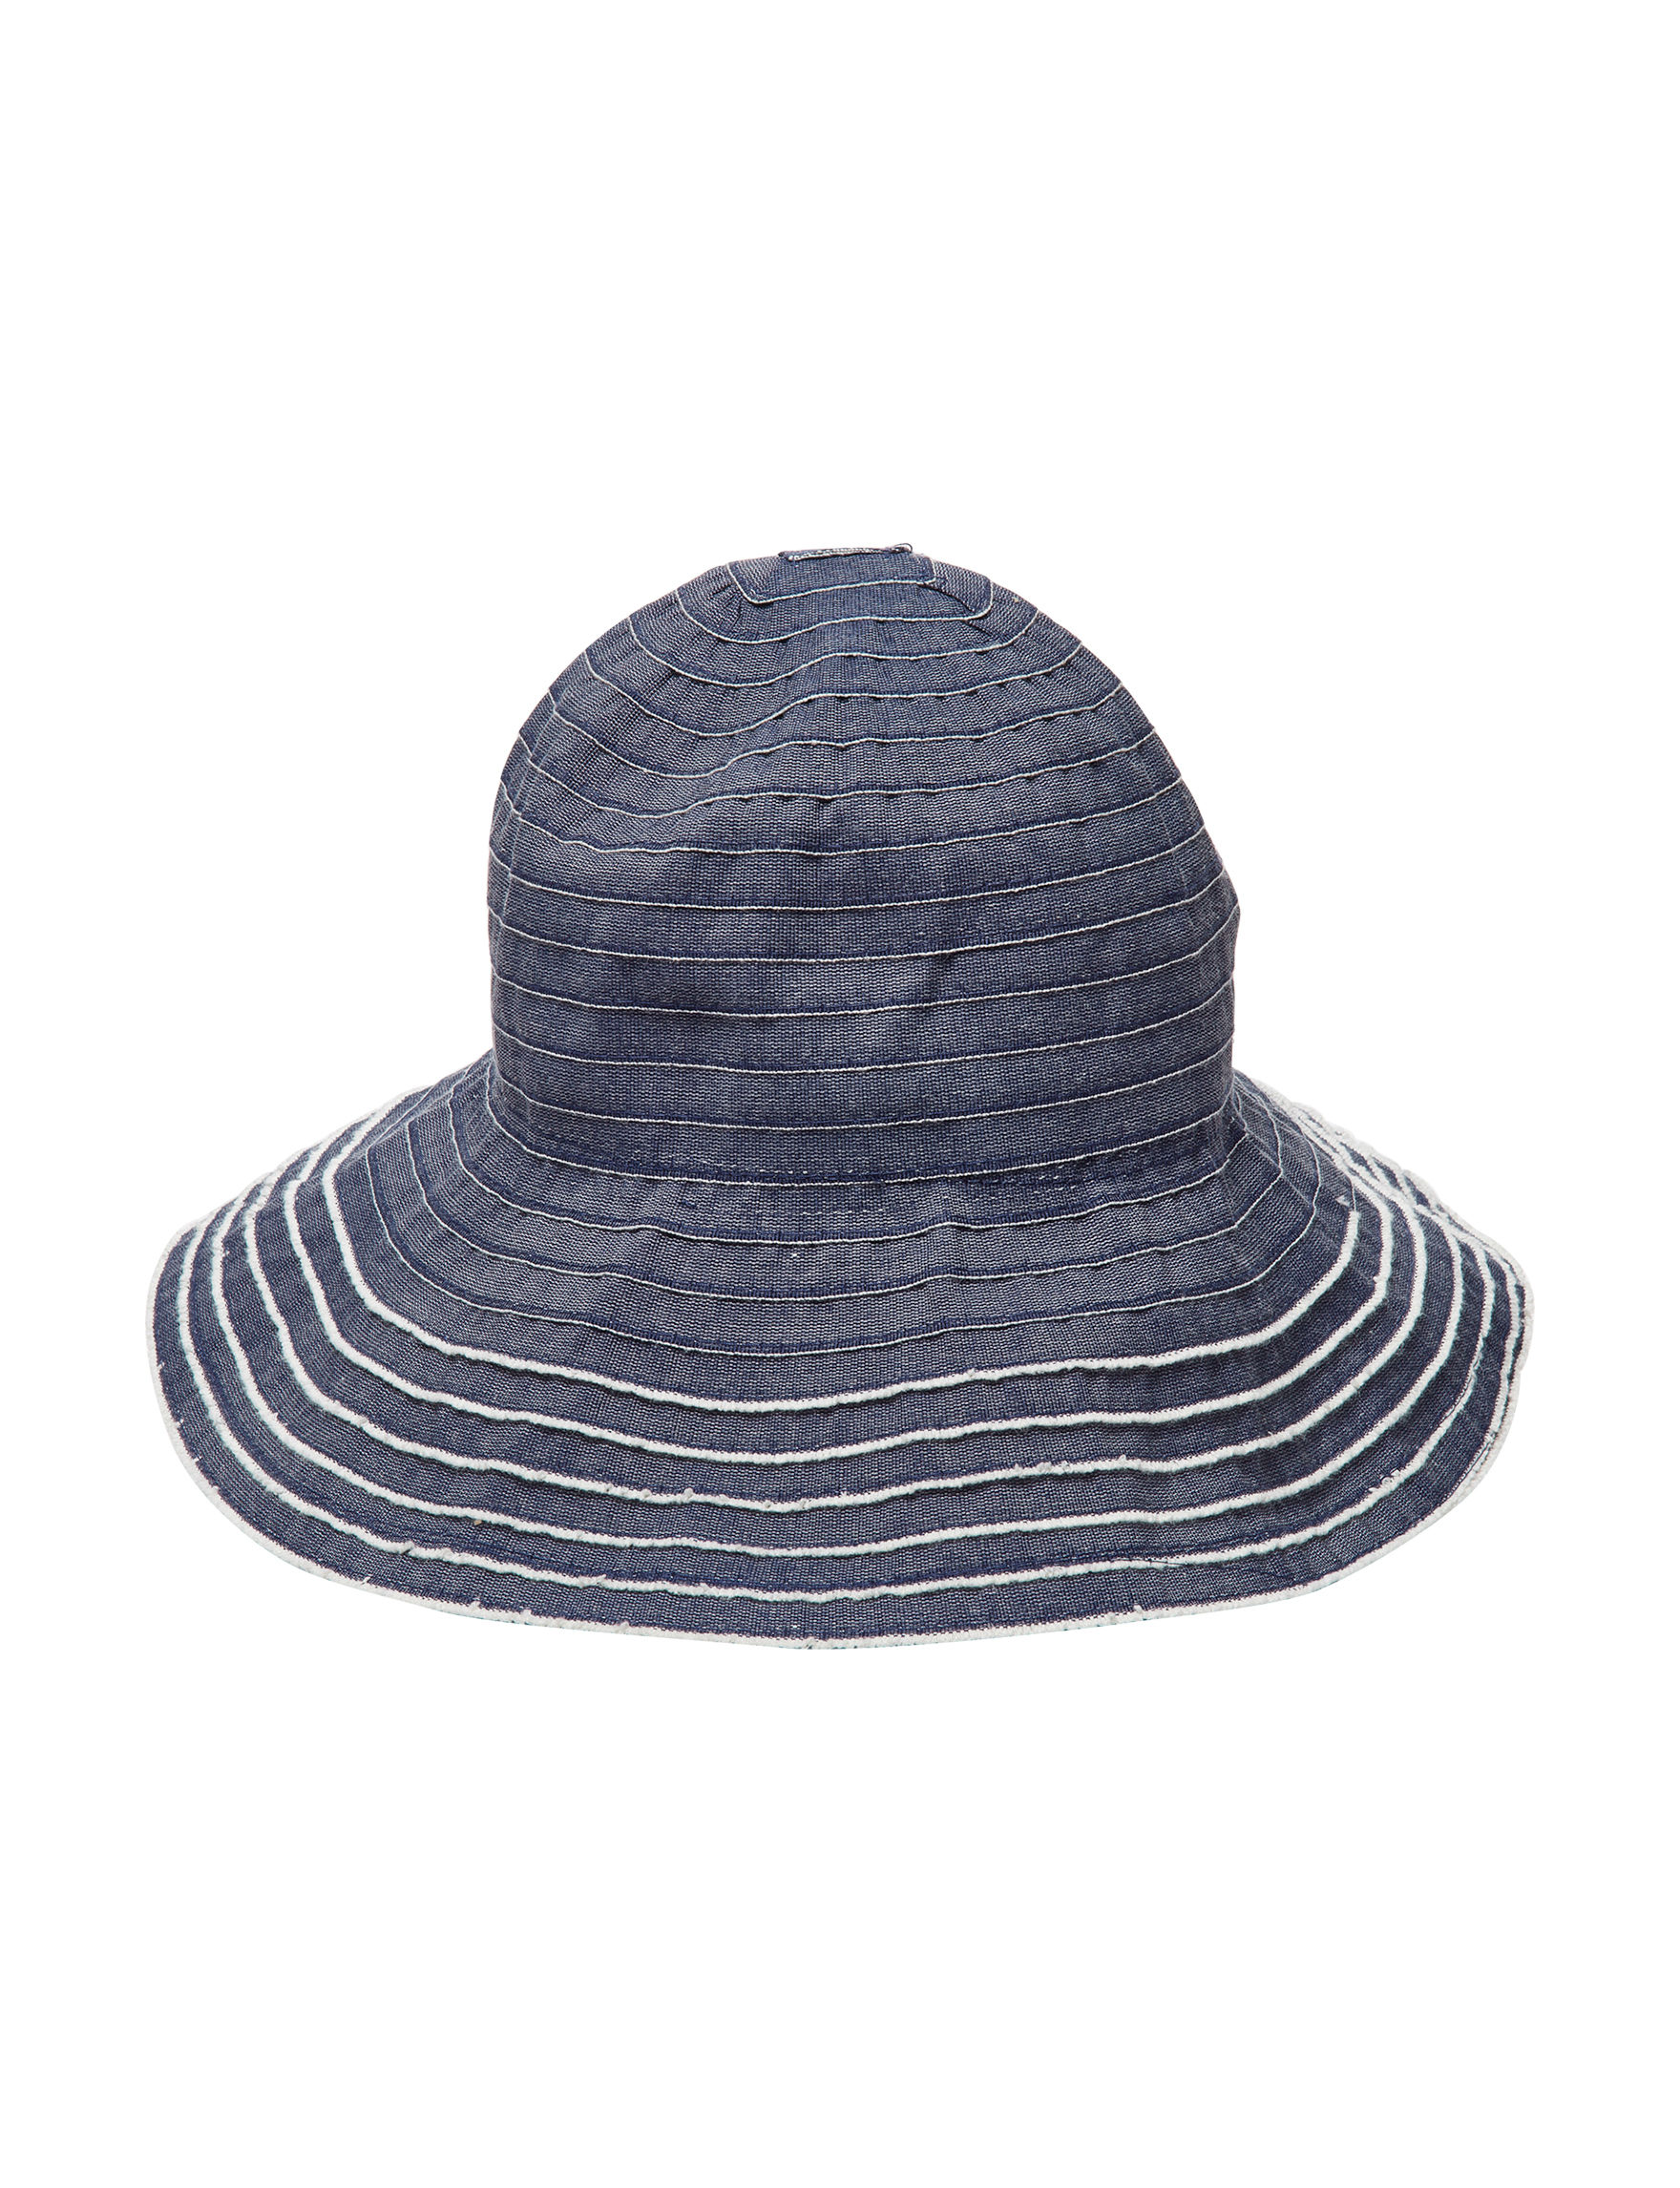 David & Young Navy Hats & Headwear